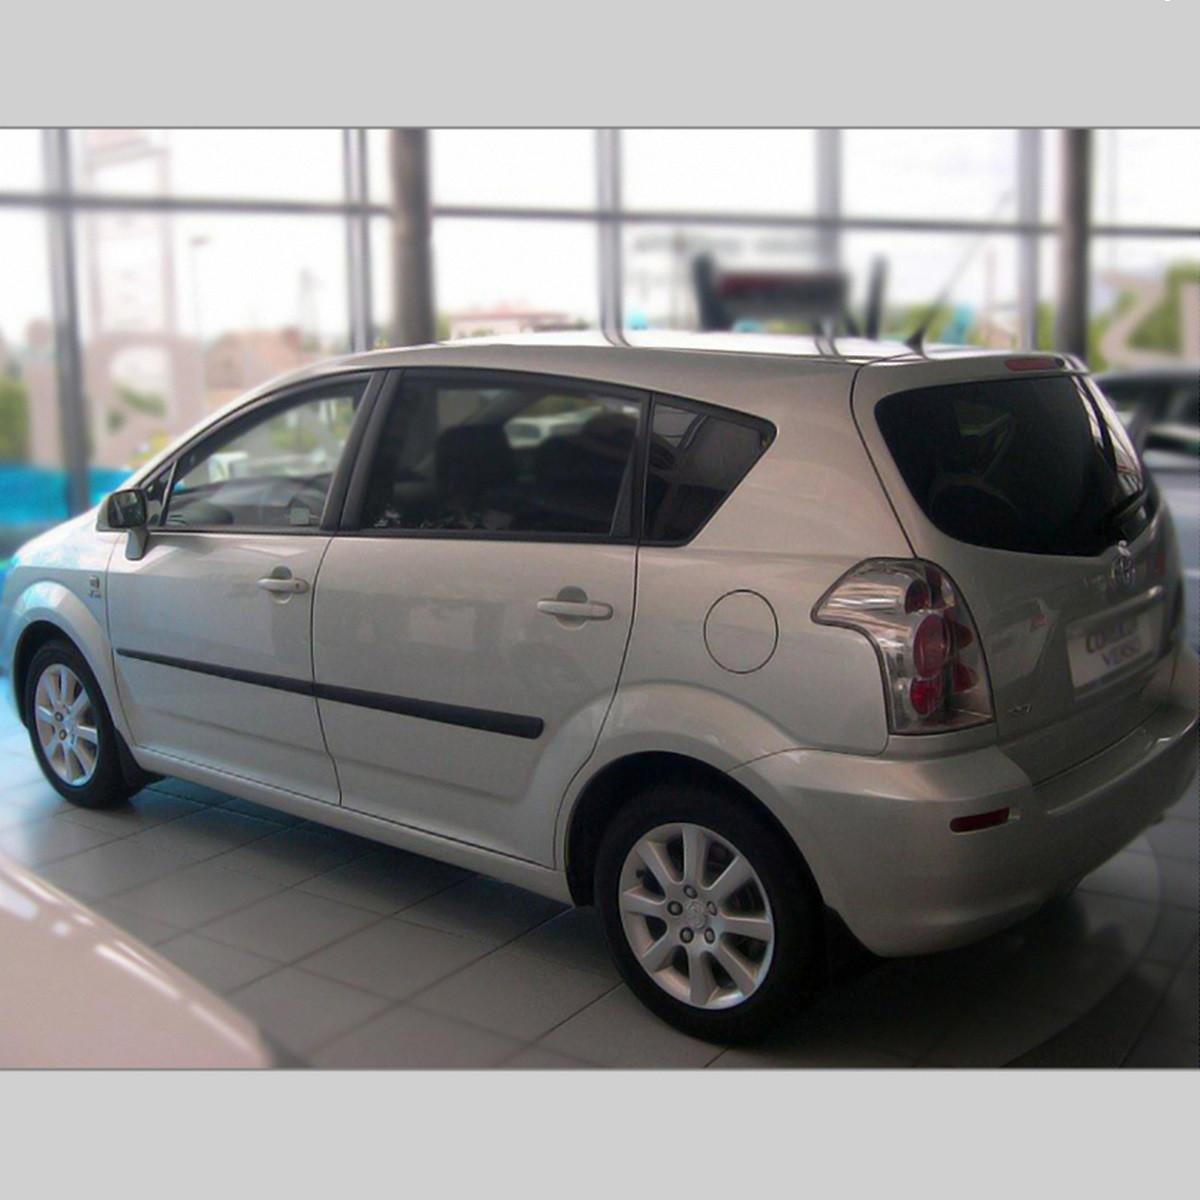 Молдинги на двері для Toyota Corolla Verso 2 2004-2009